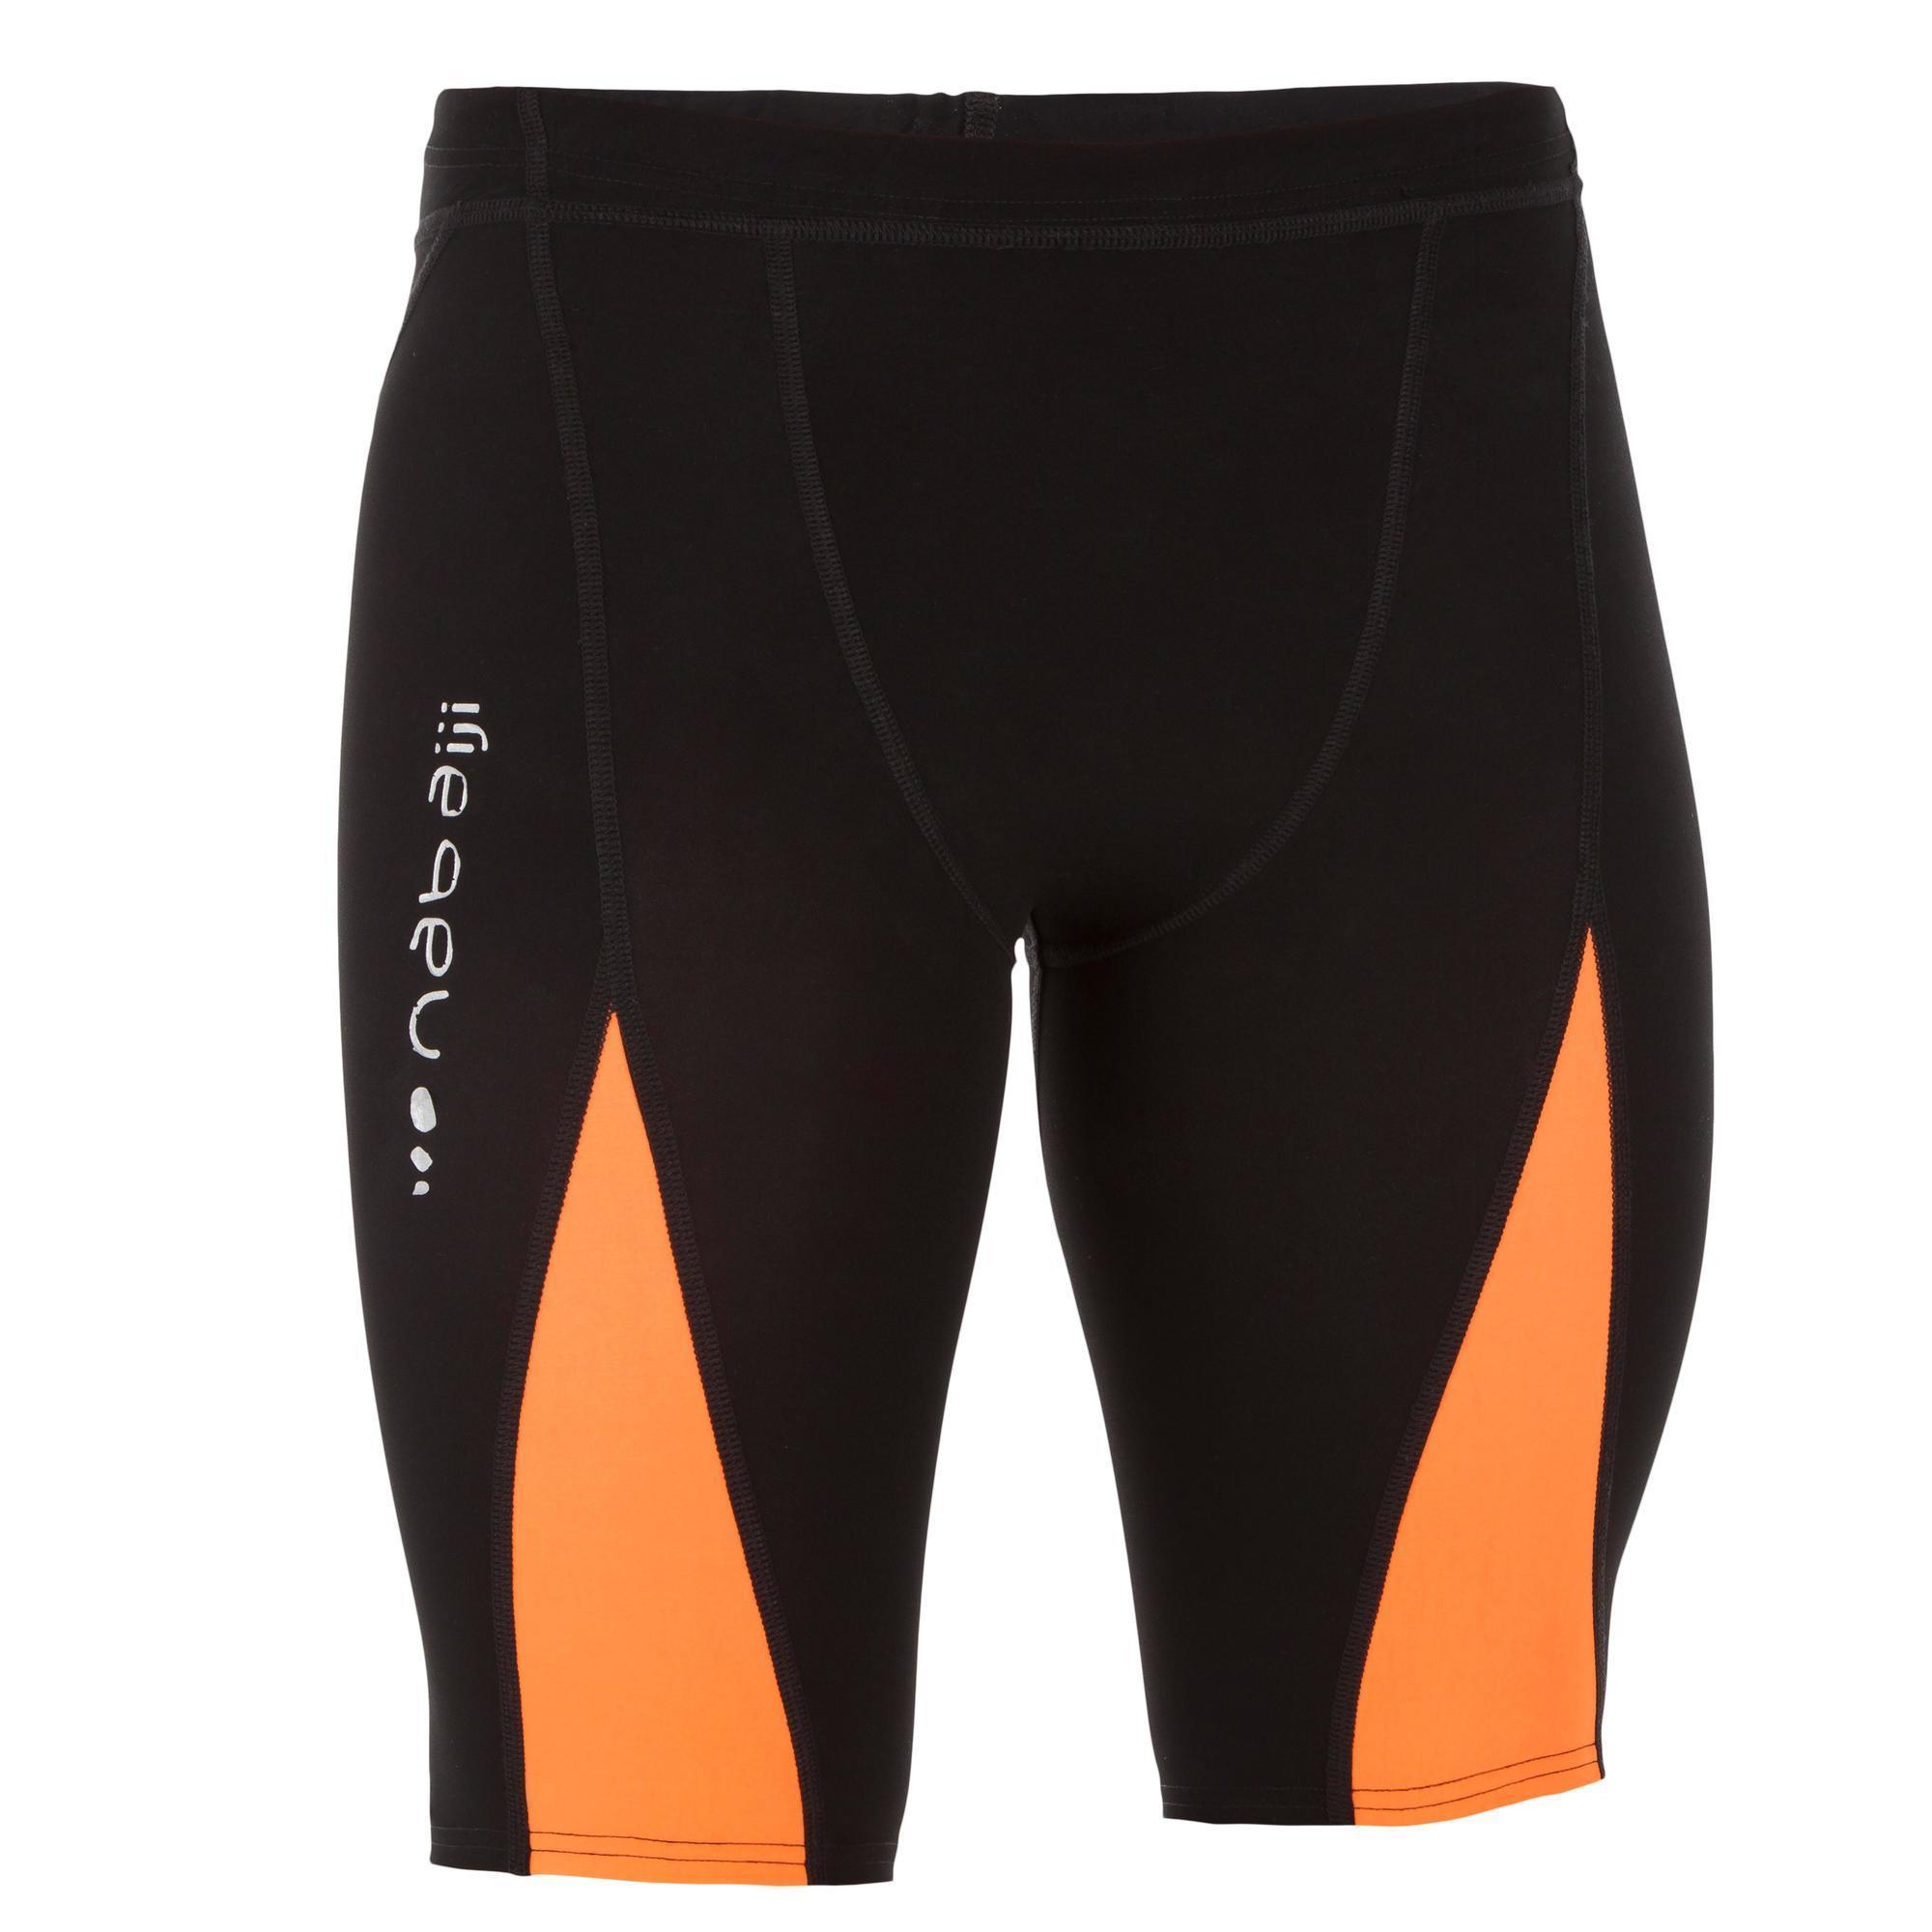 Maillot de bain de competition homme jammer fina 990 fast orange nabaiji - Decathlon costumi piscina ...